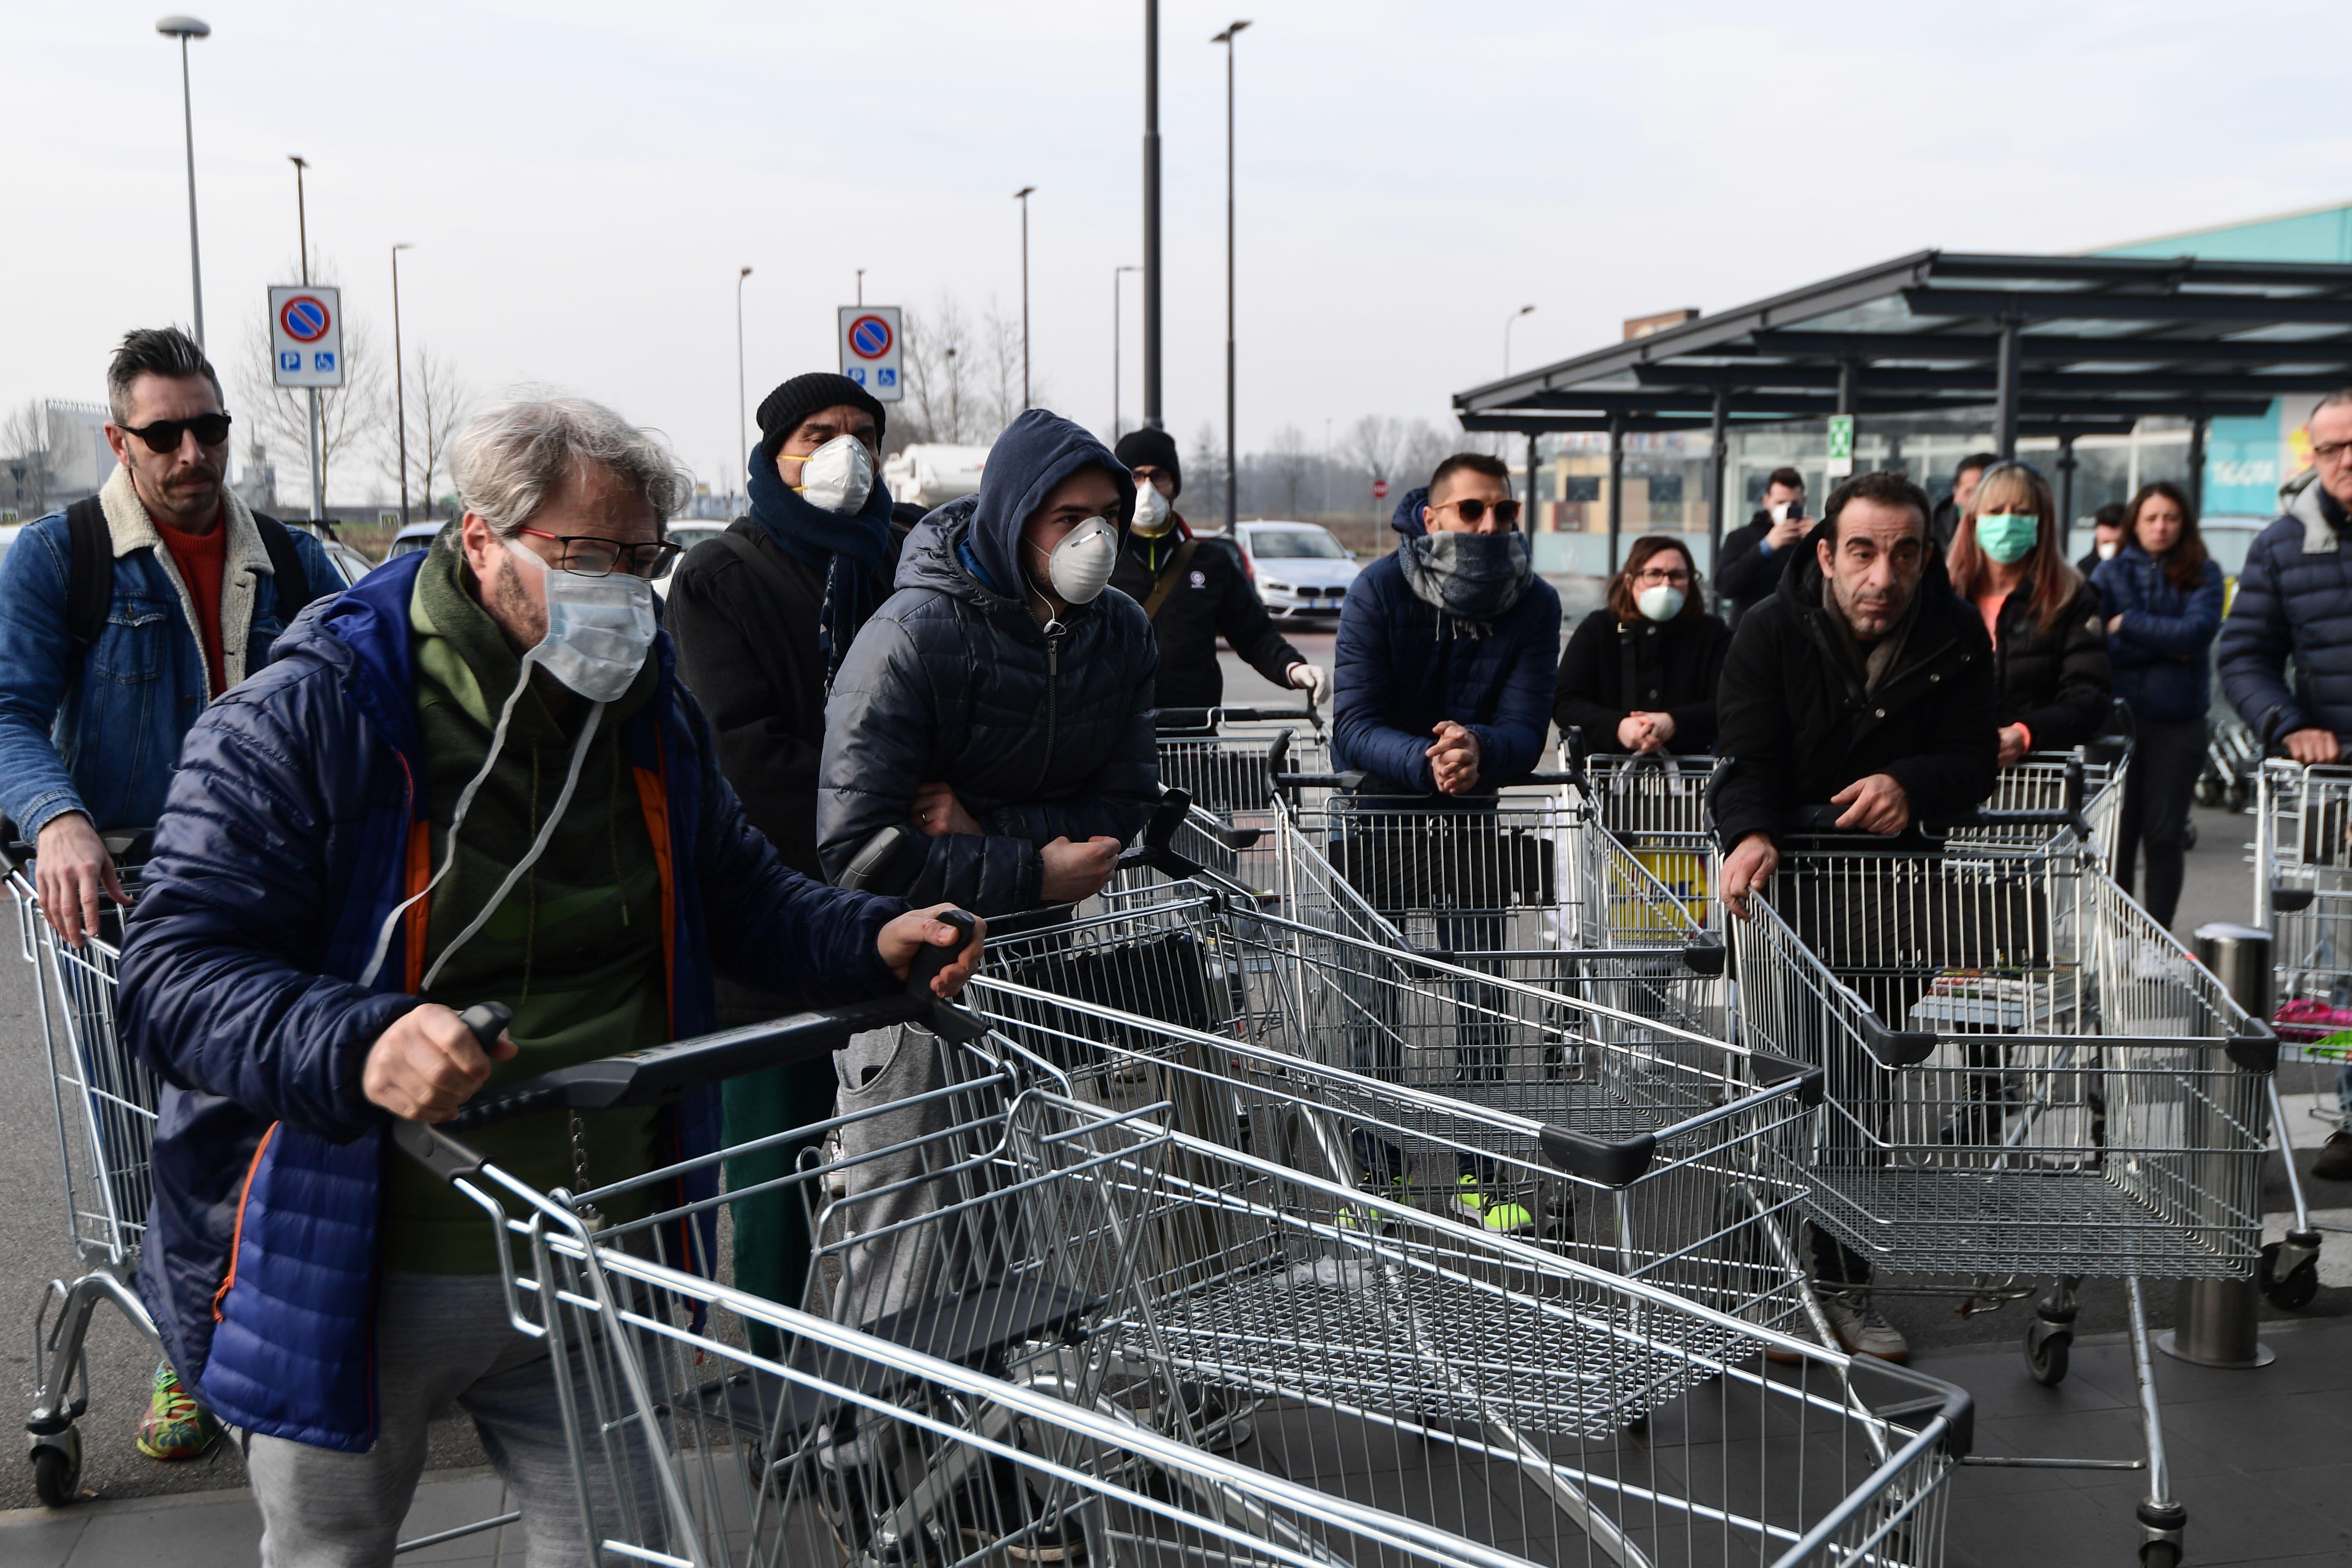 Italian stocks plunge 4% as coronavirus shuts down towns, schools and soccer matches